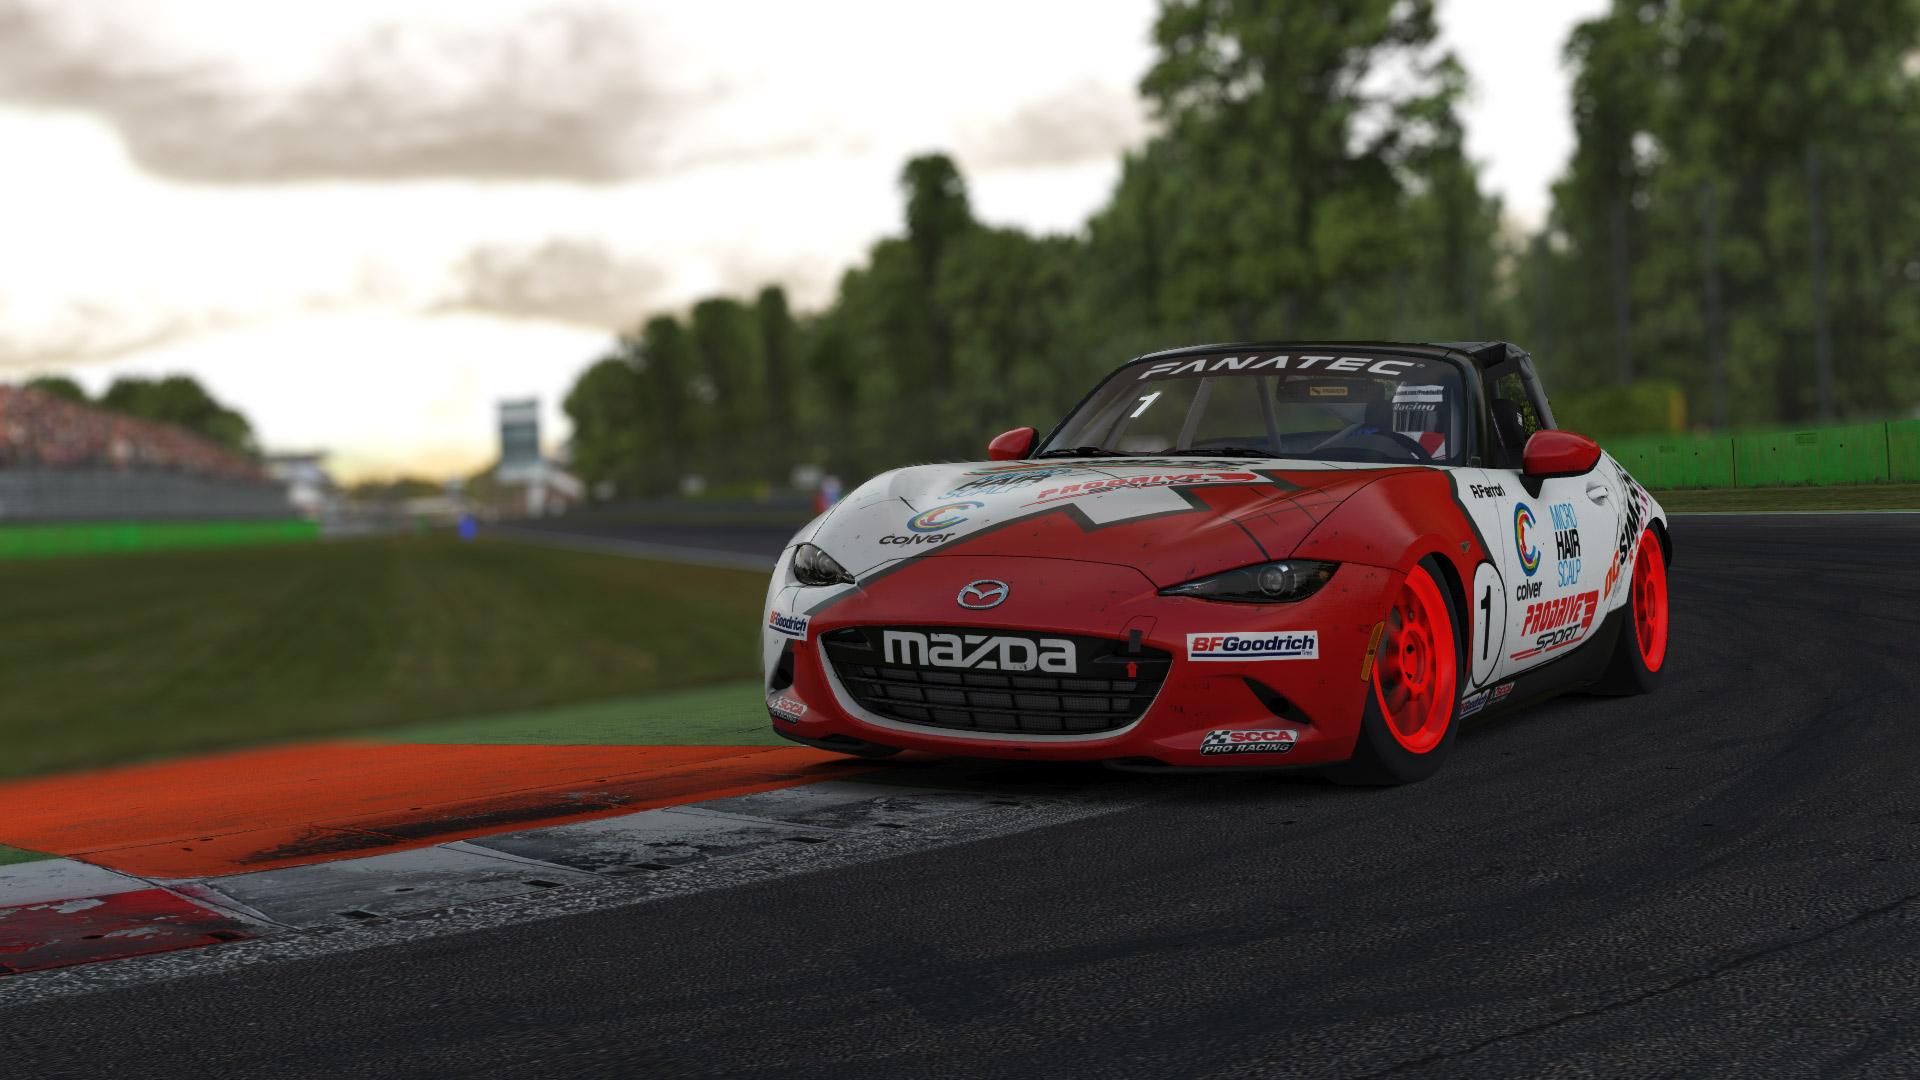 Mazda iRacing sponsor